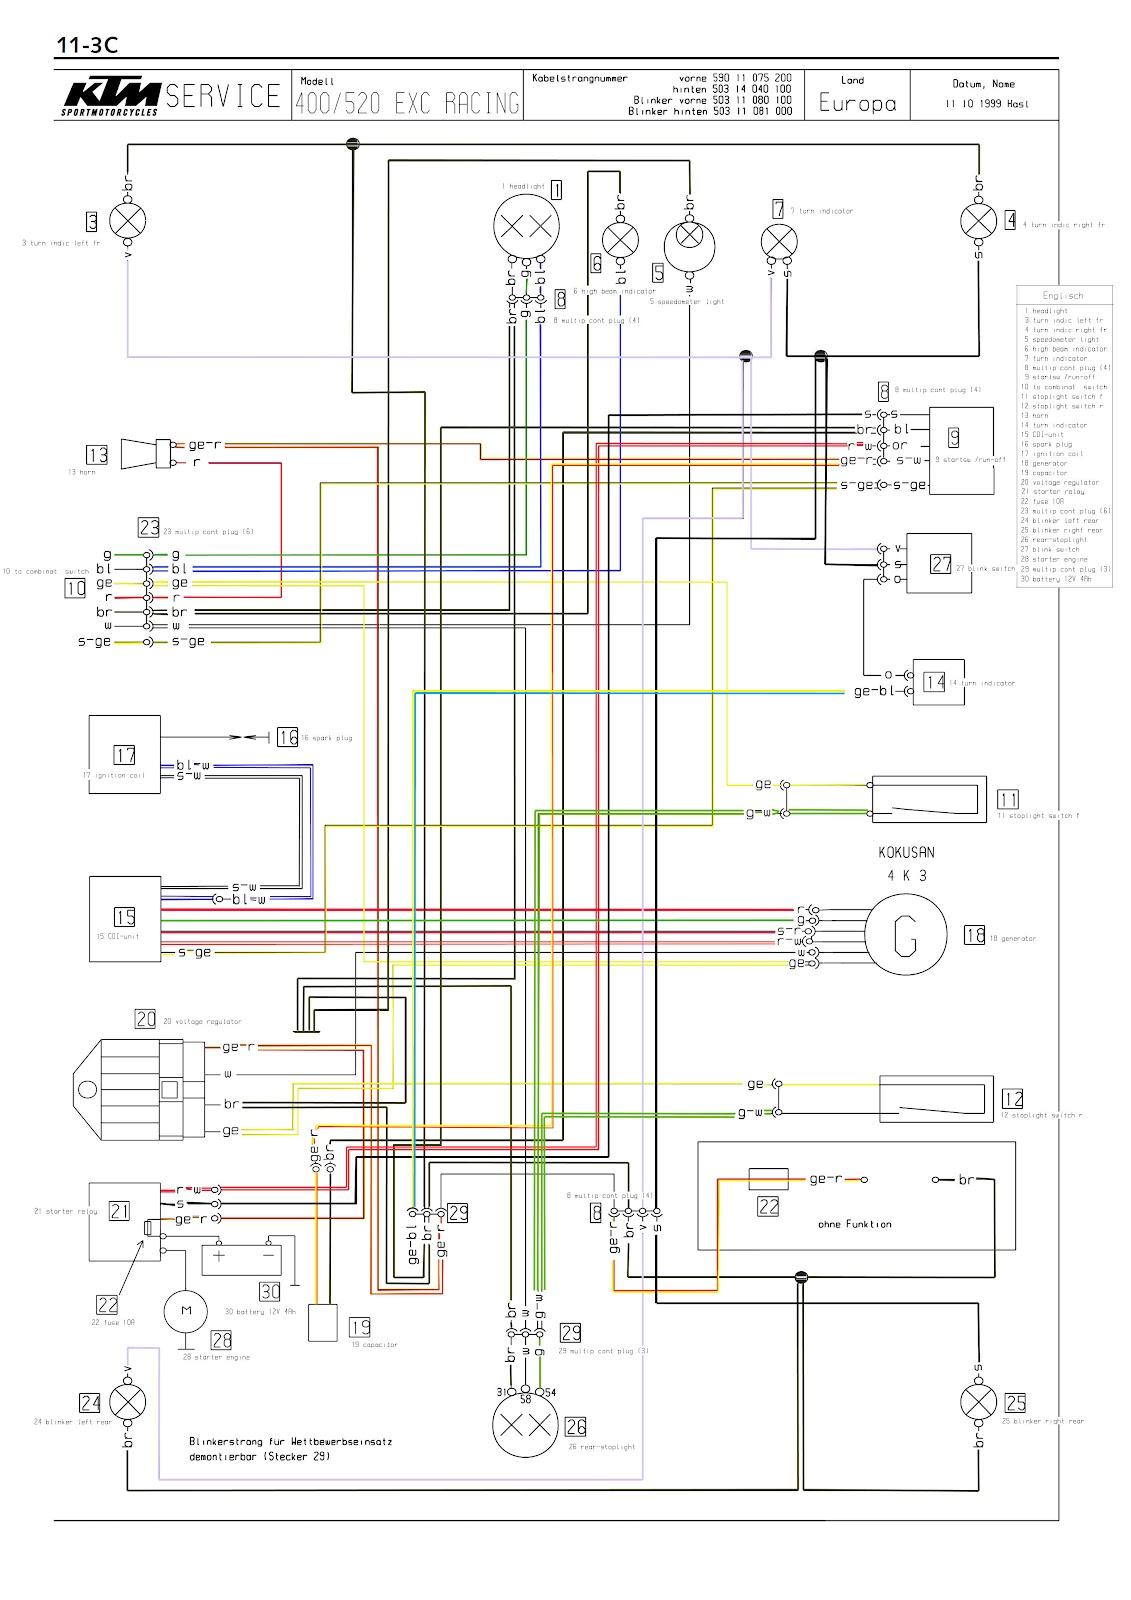 hight resolution of ktm 400 wiring diagram wiring library 2001 ktm 400 exc wiring diagram ktm 400 wiring diagram